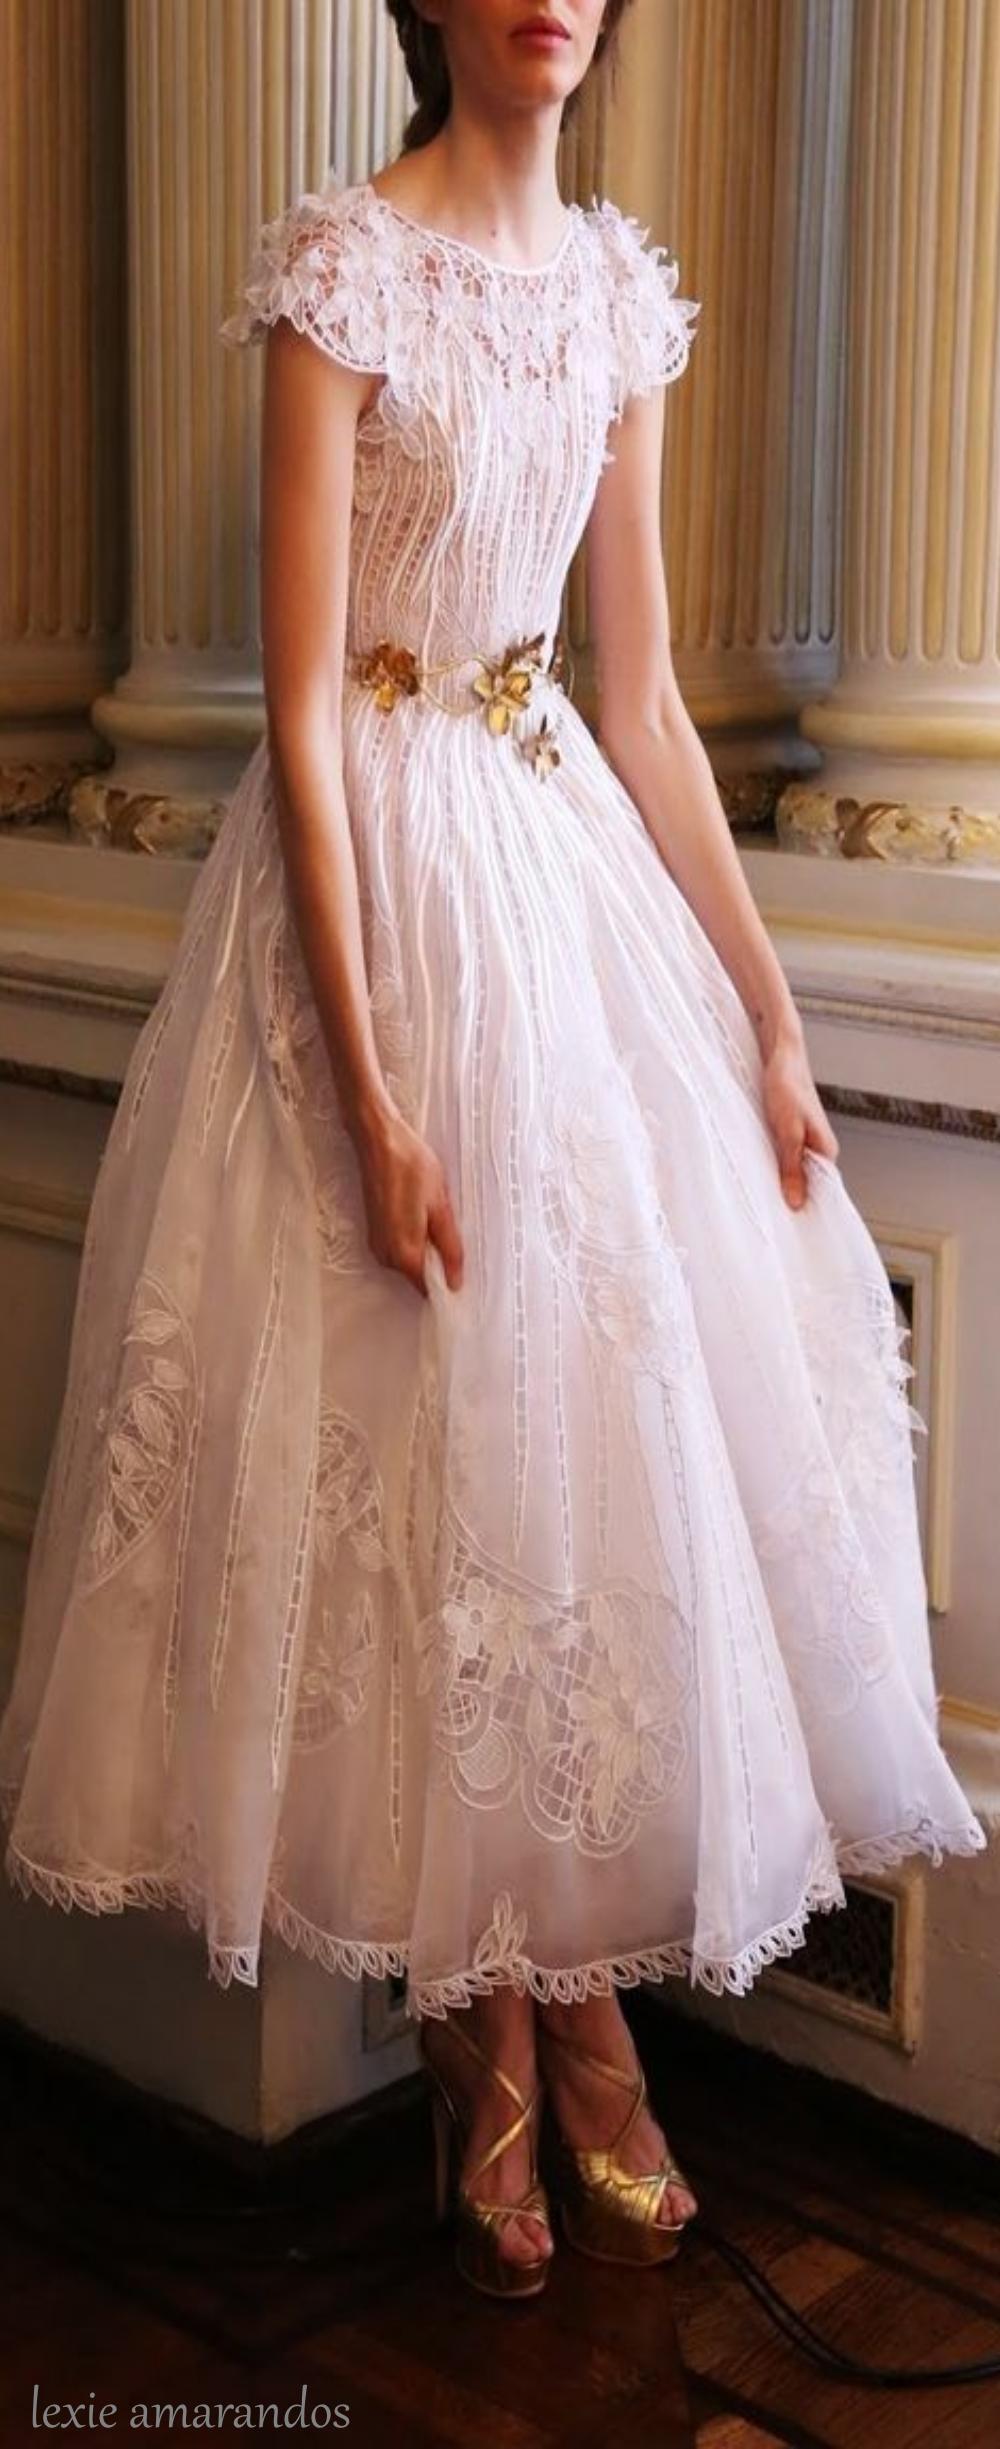 Javier Saiach Haute Couture. | Weddings | Pinterest | Gowns ...